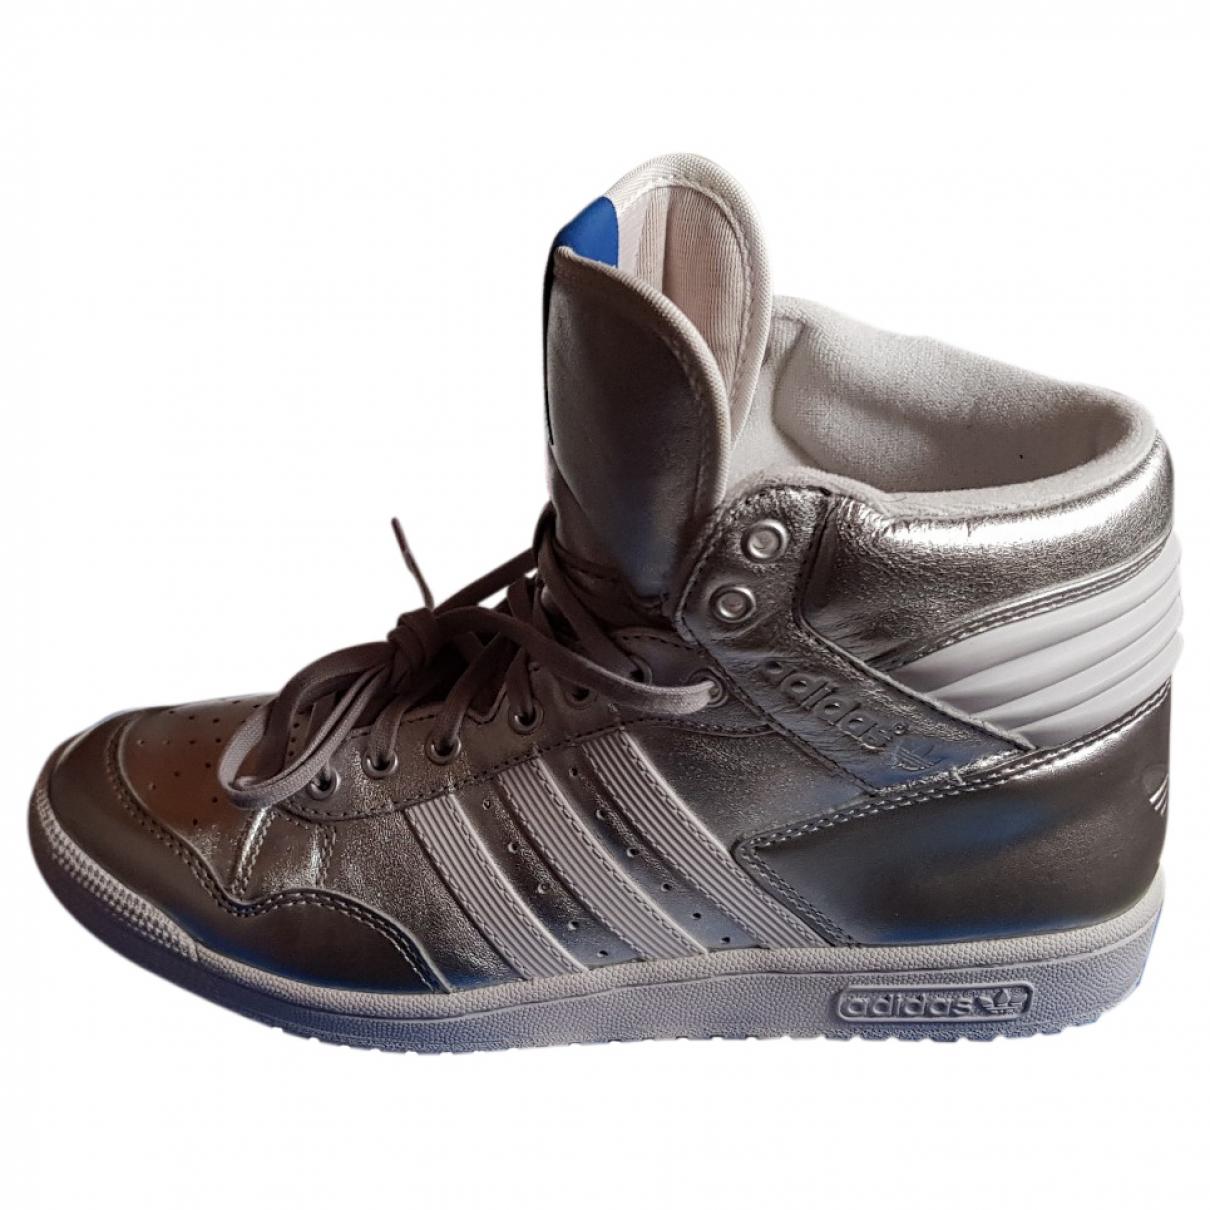 Adidas \N Metallic Leather Trainers for Men 42 EU